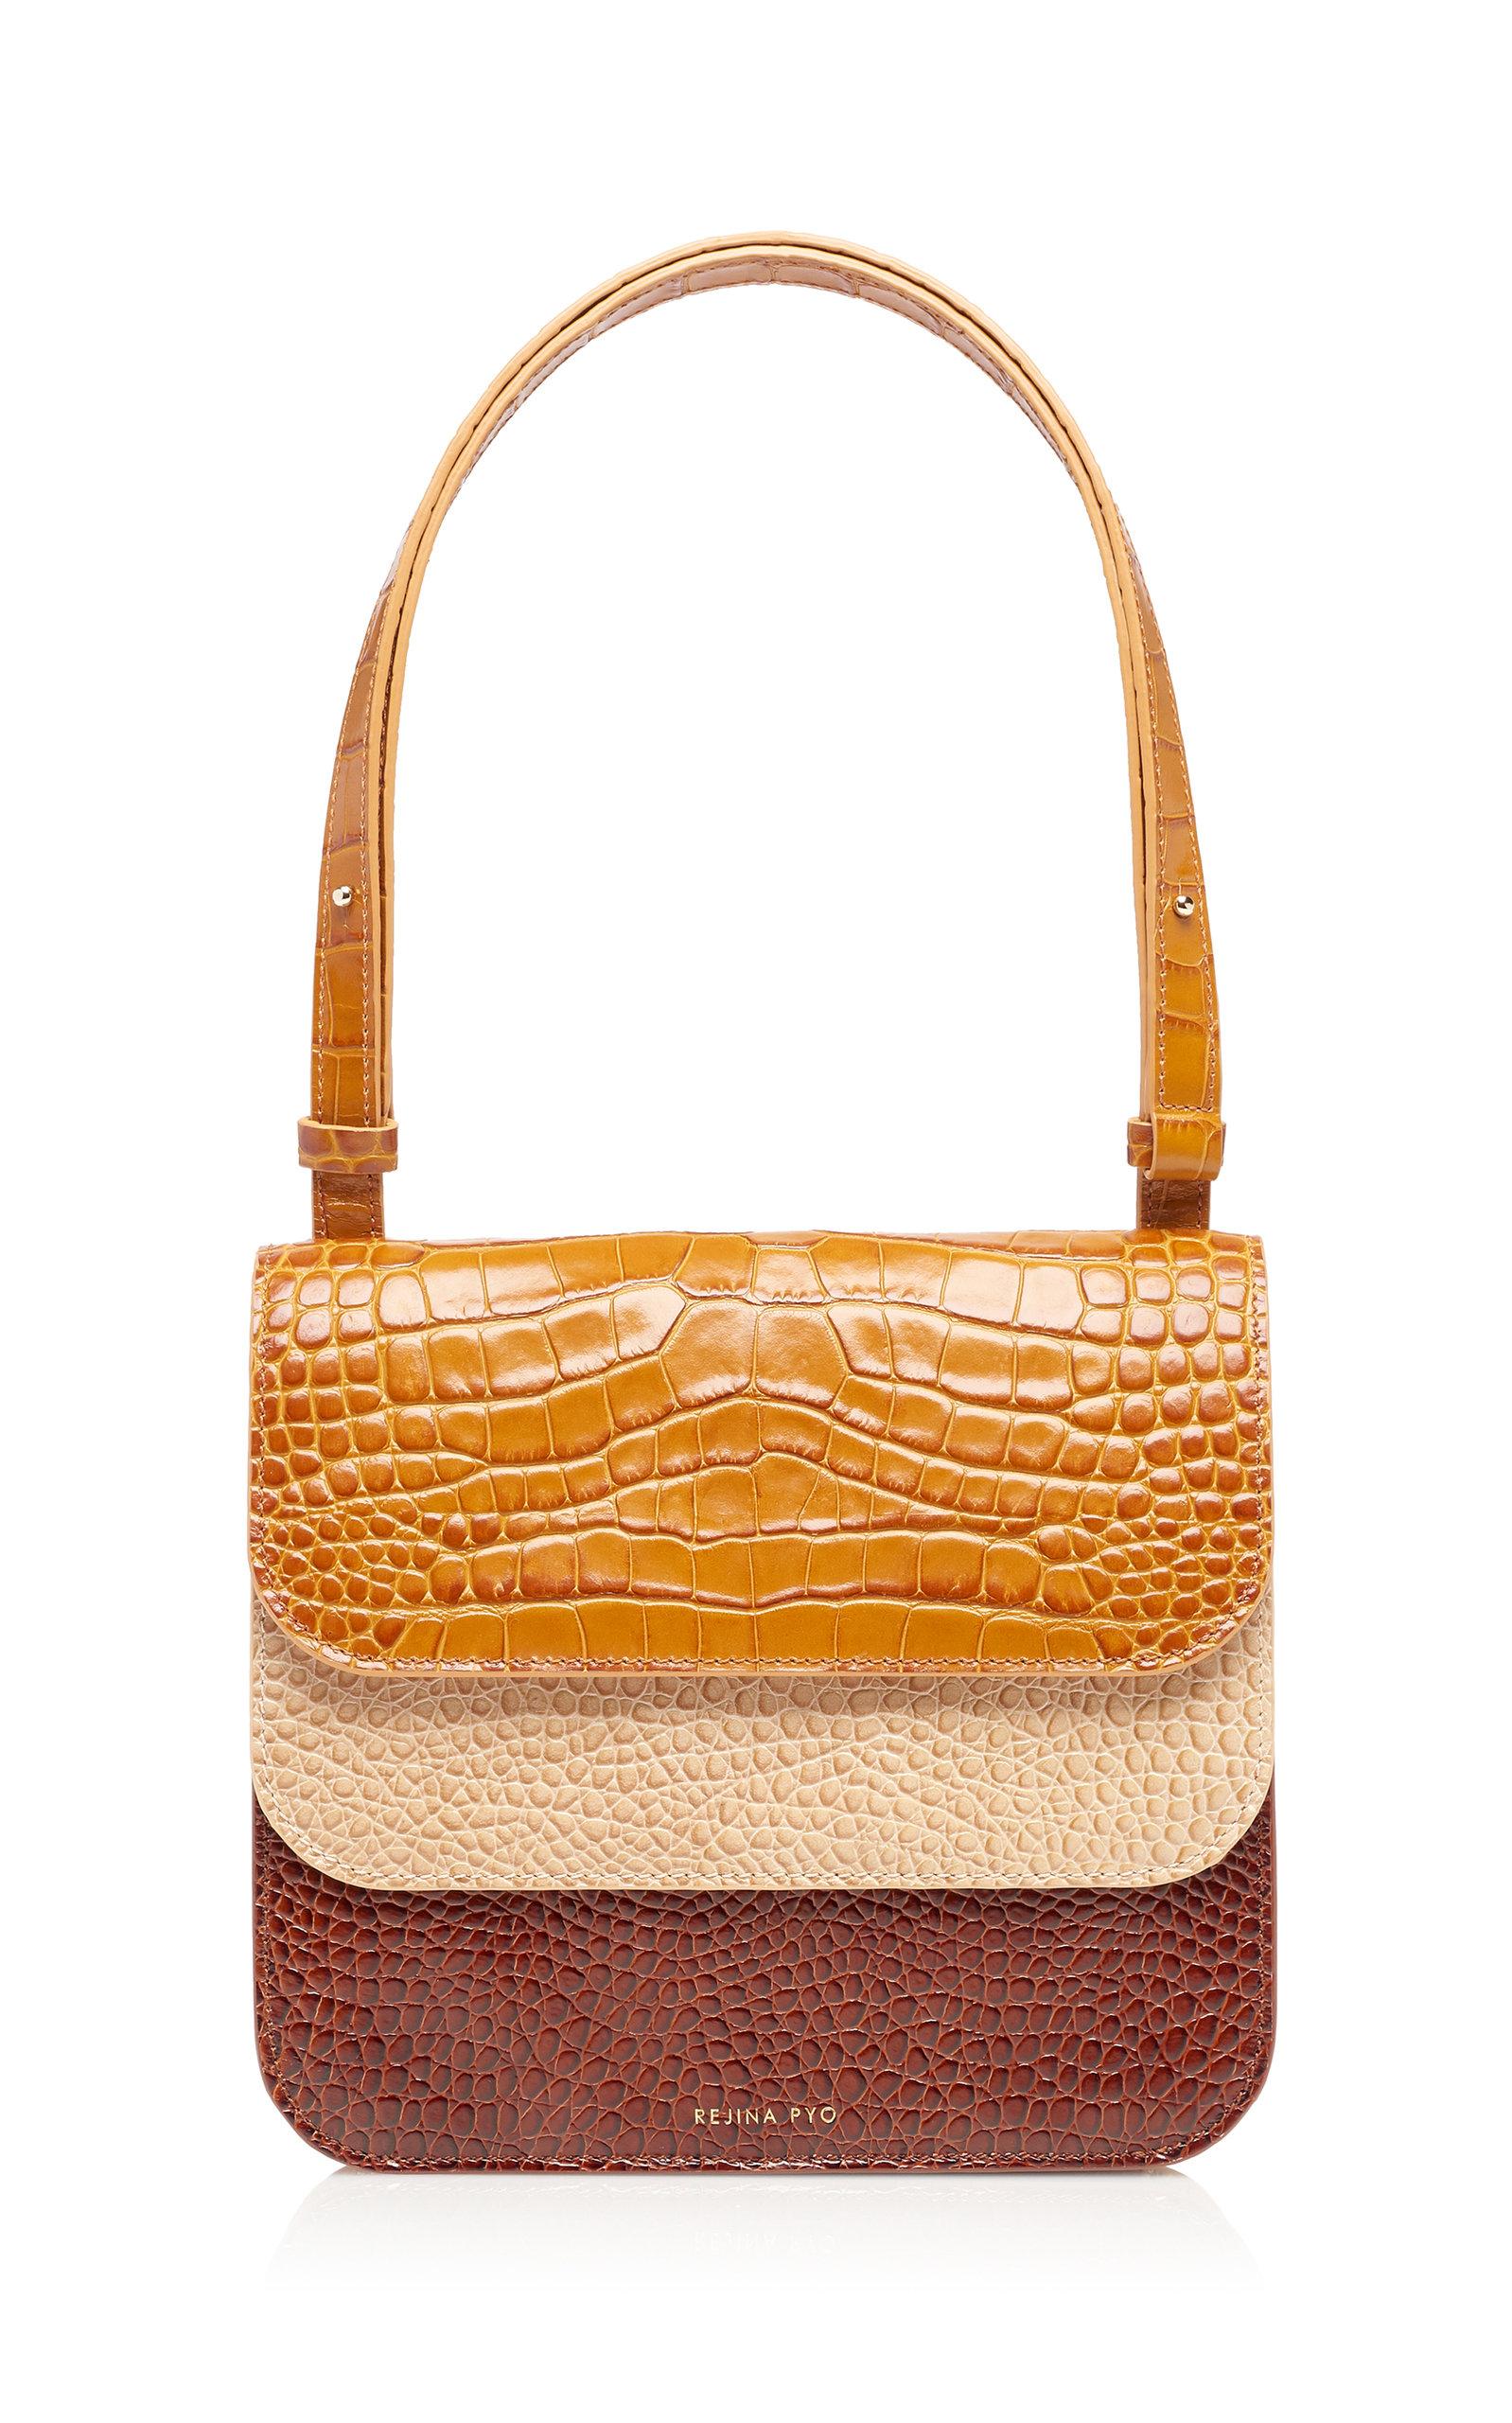 7cb197df396 Women's Bags   Moda Operandi   Moda Operandi